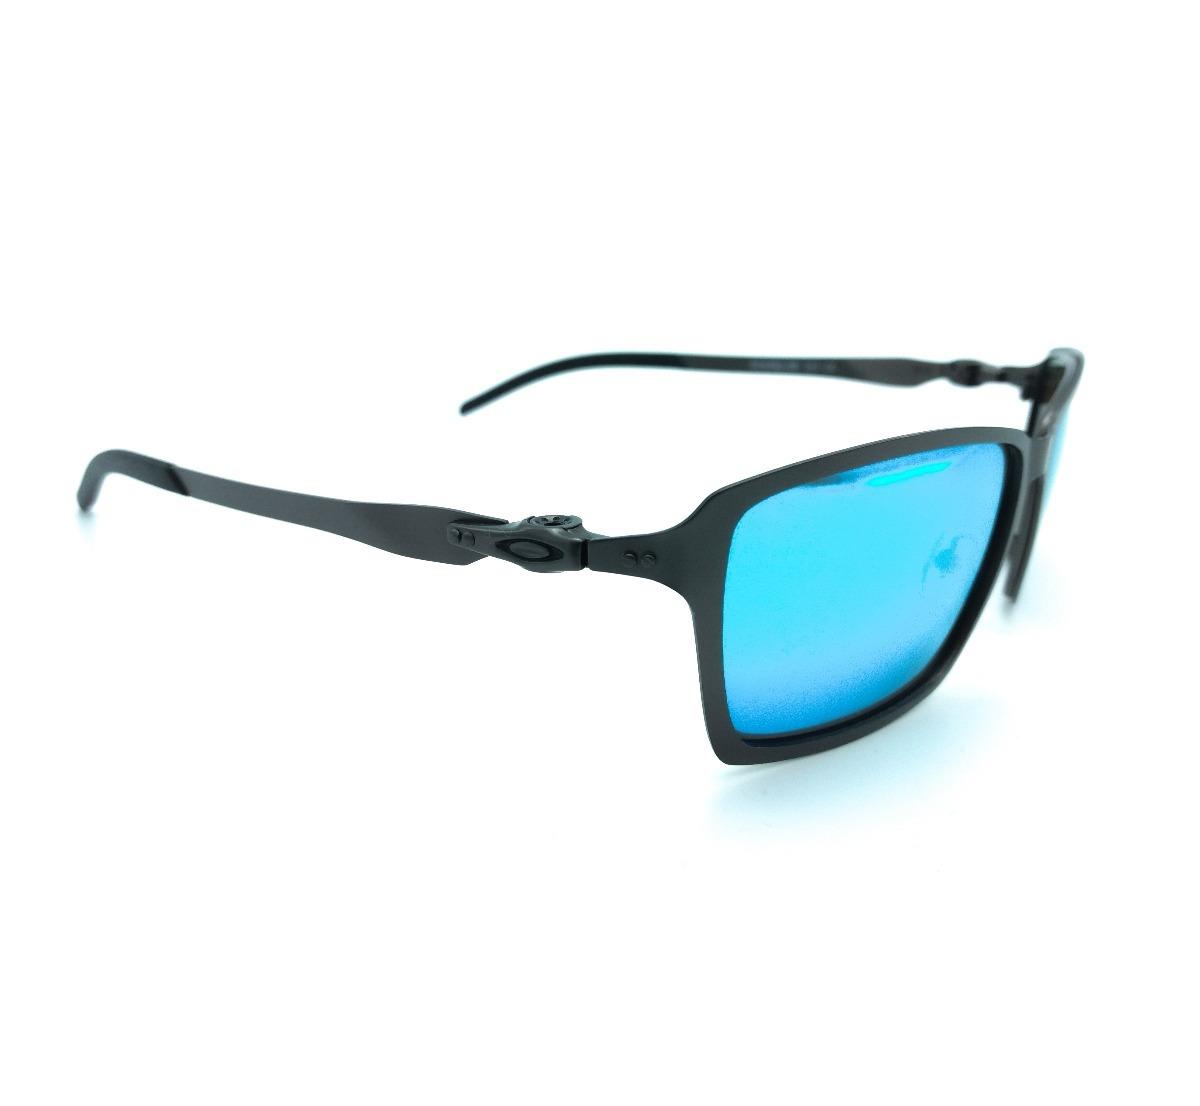 7c7880435 óculos oakley tincan ferrari 100% polarizado frete grátis. Carregando zoom.